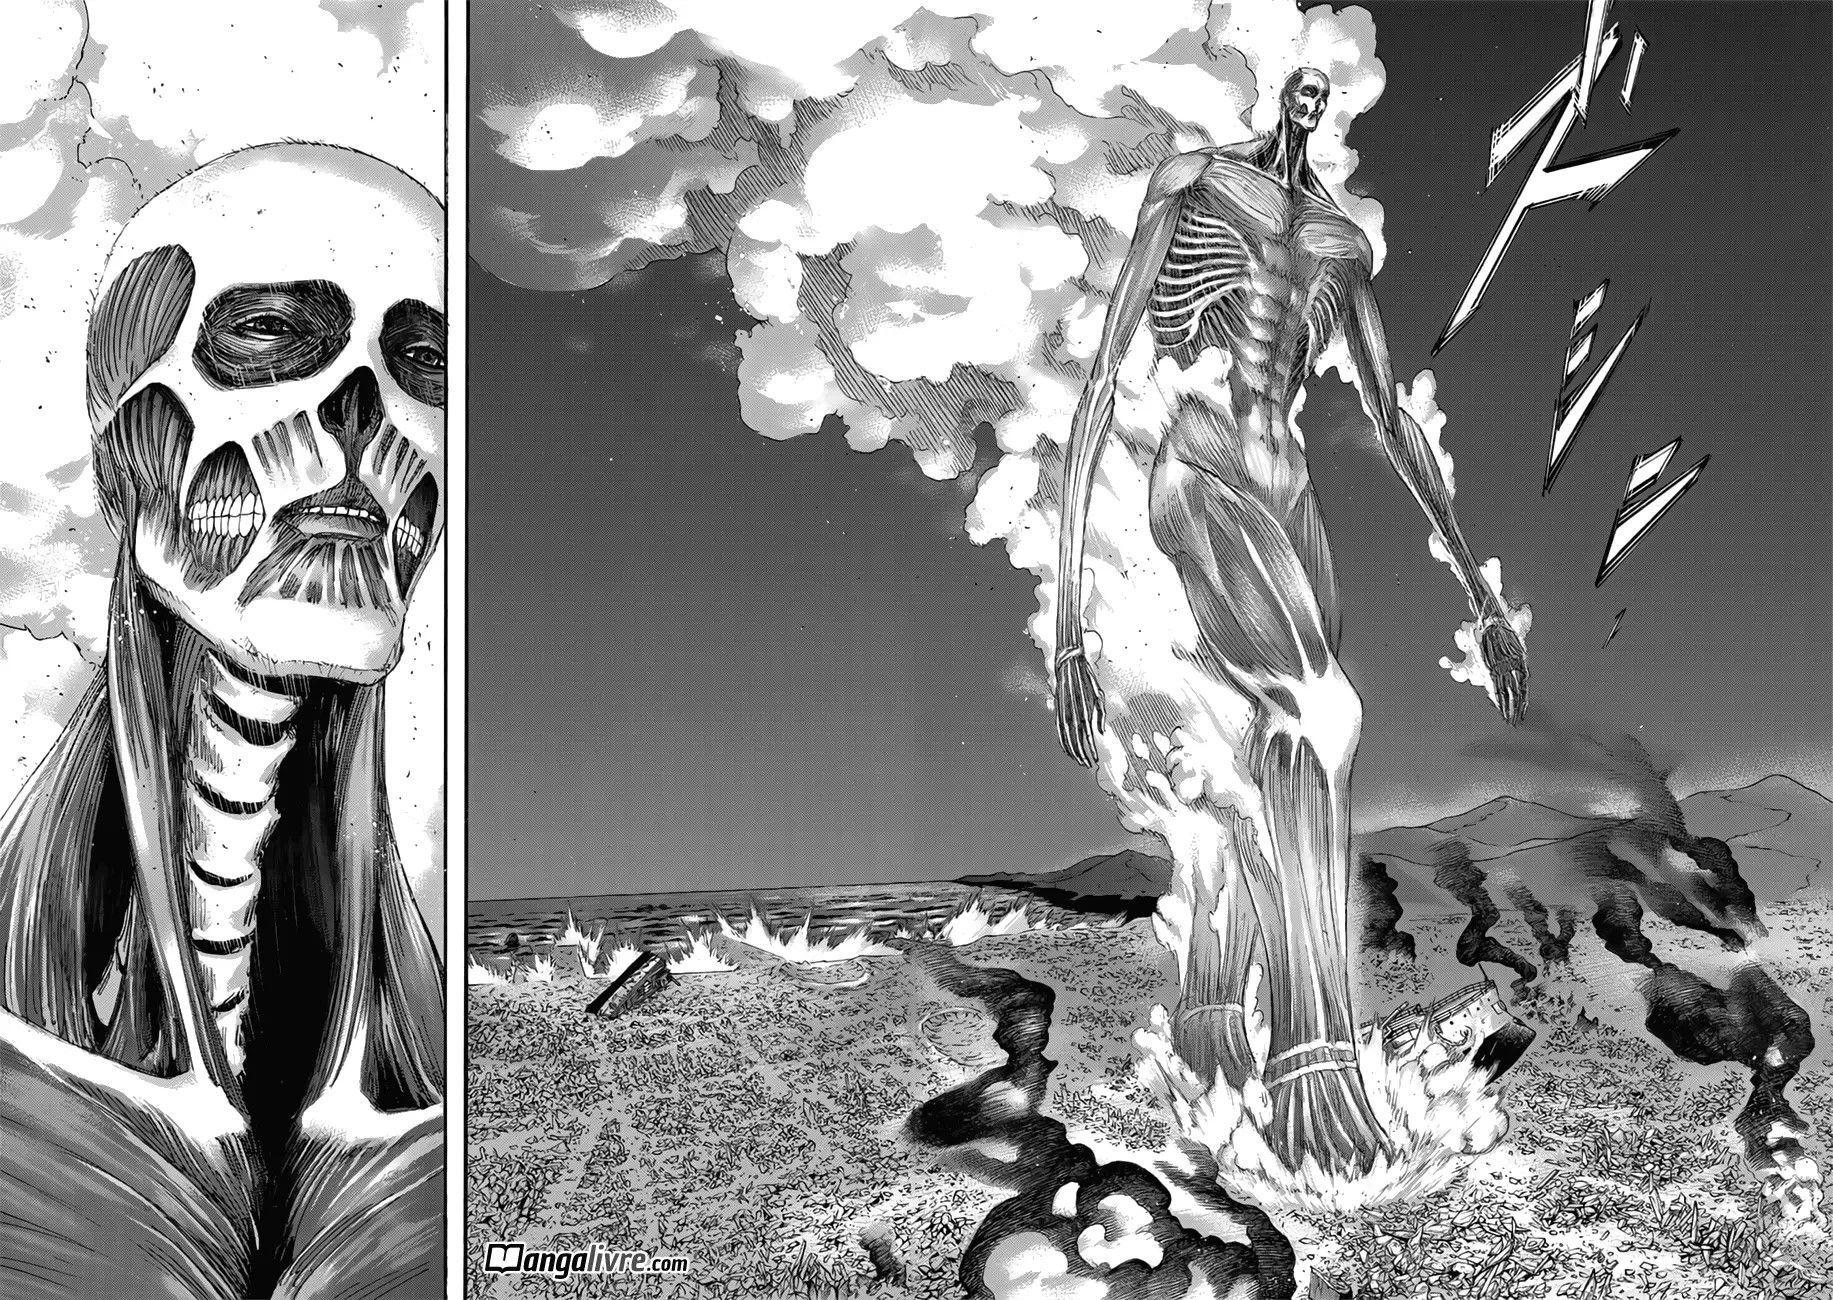 Armin Colosal Manga Snk Con Imagenes Kyojin Armin Shingeky